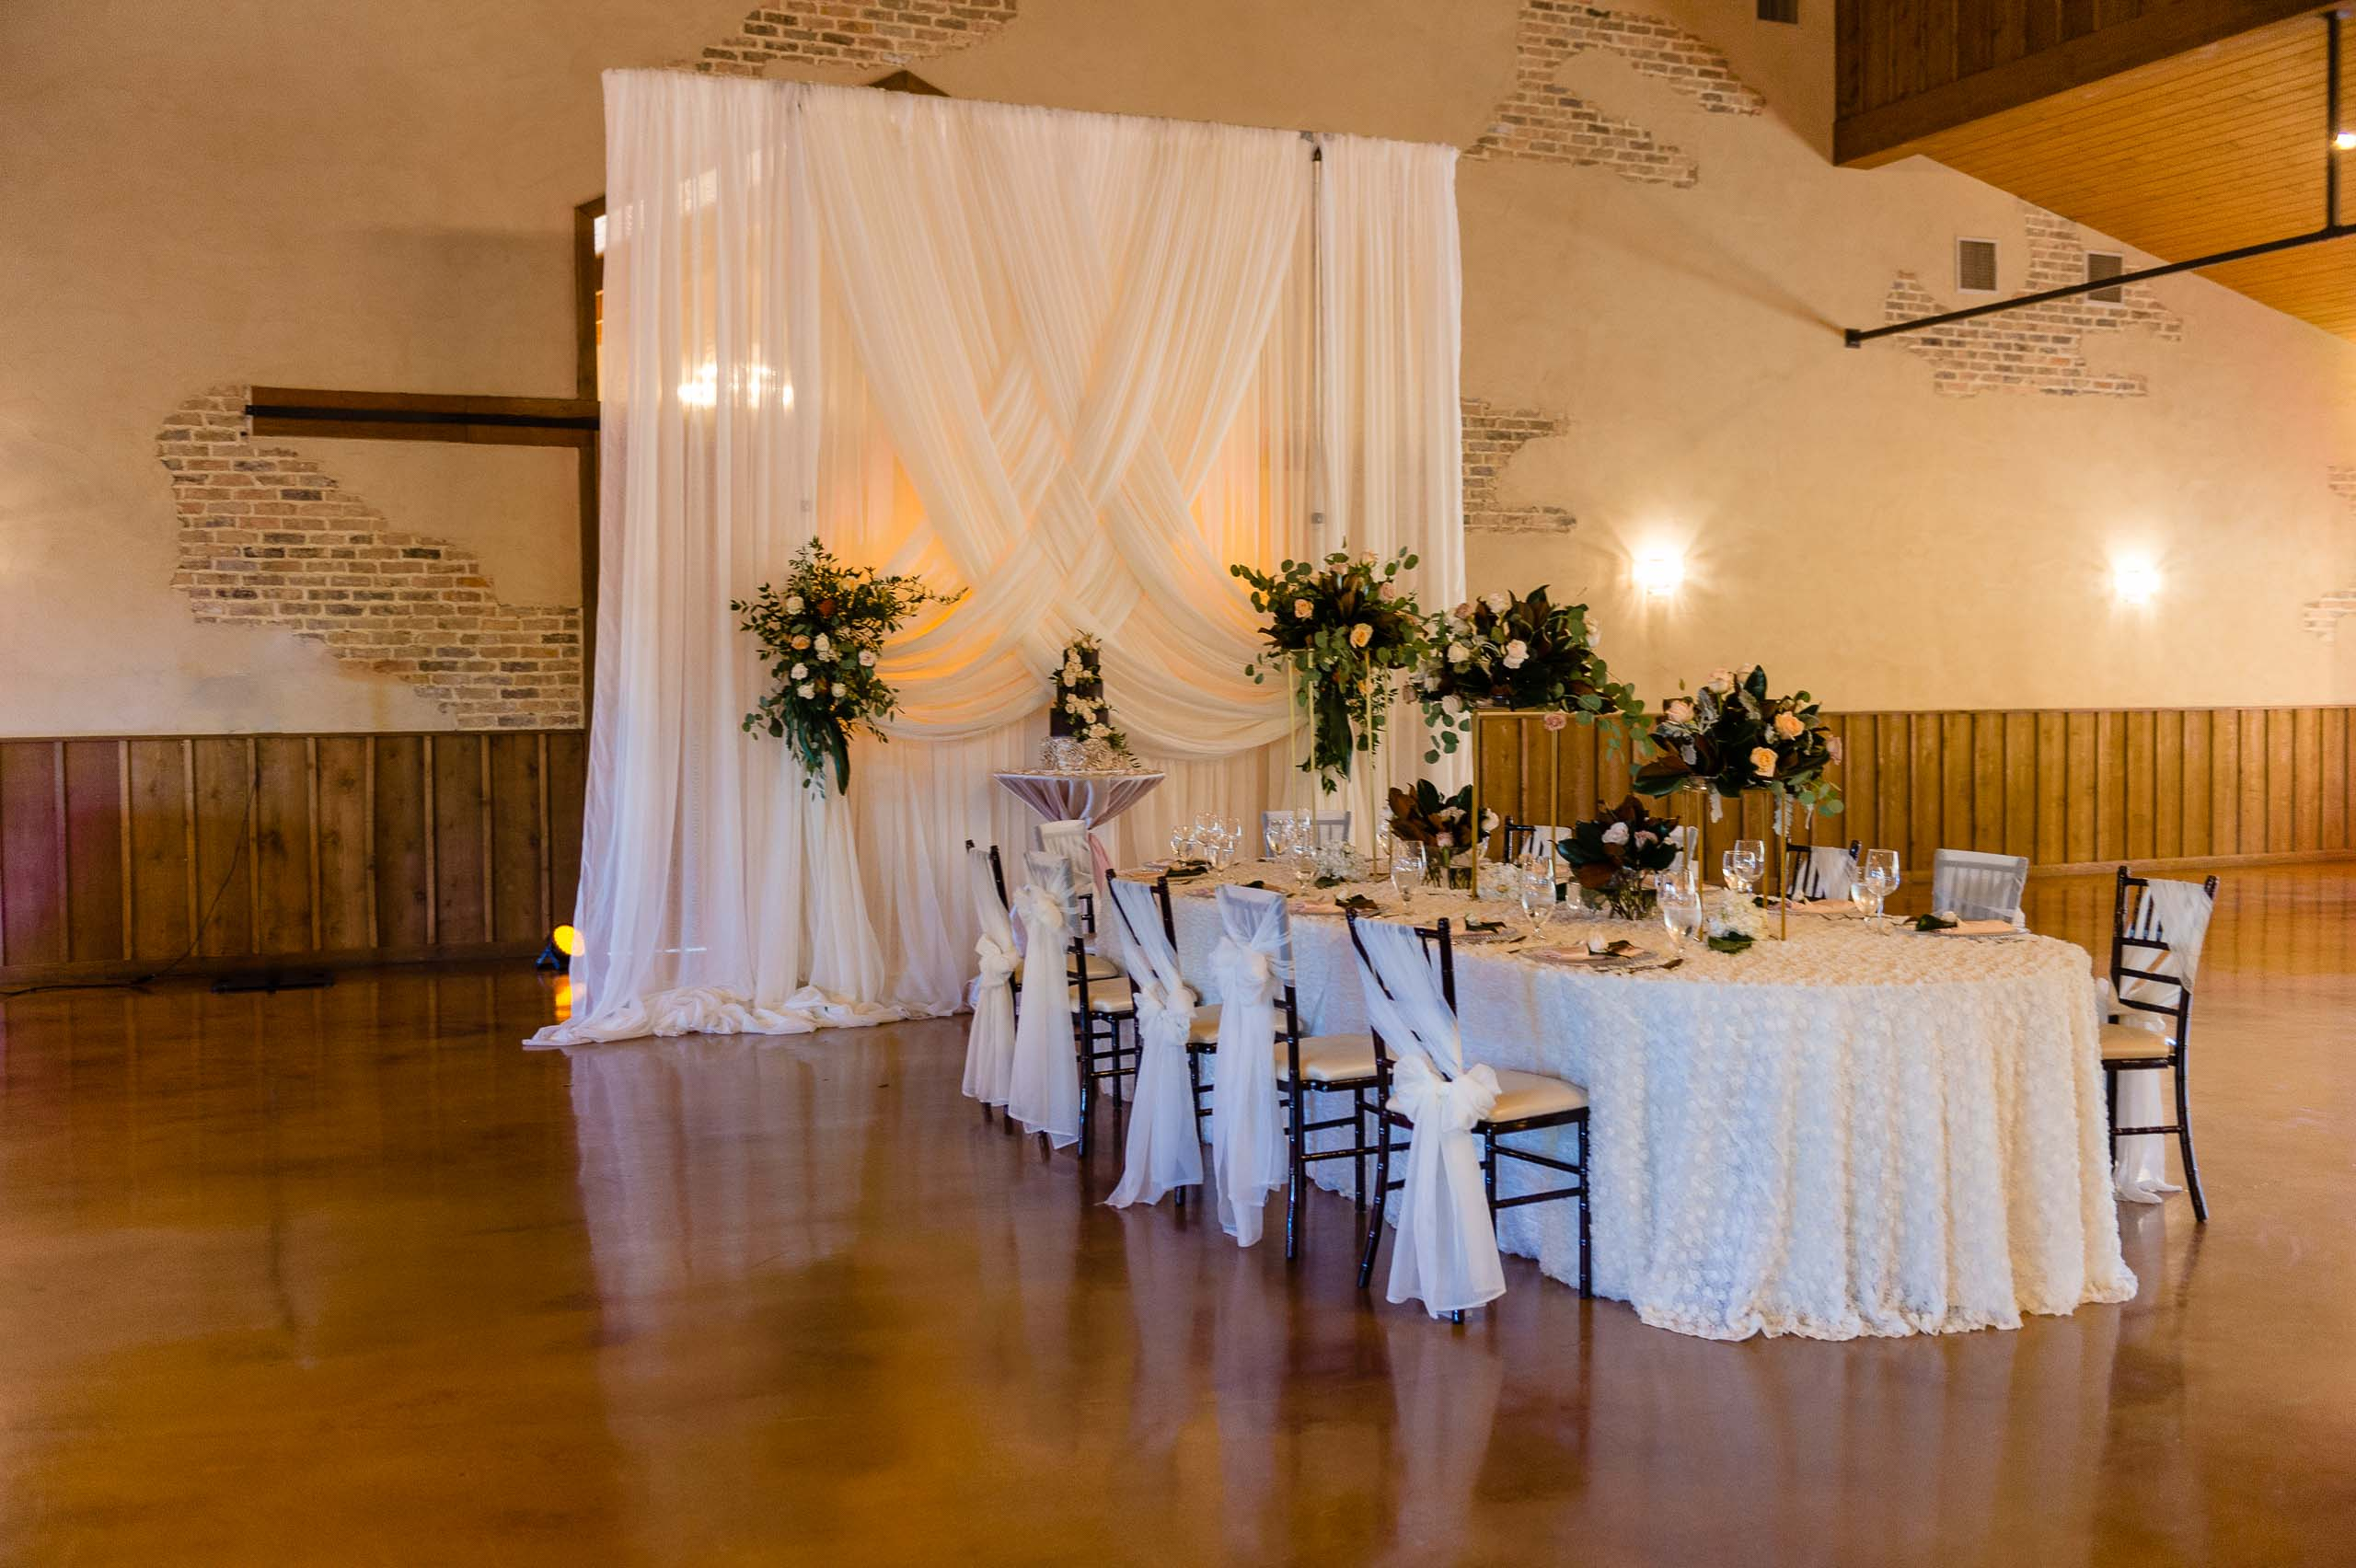 chandelier-of-gruene-winter-wedding-inspiration-_4S28009